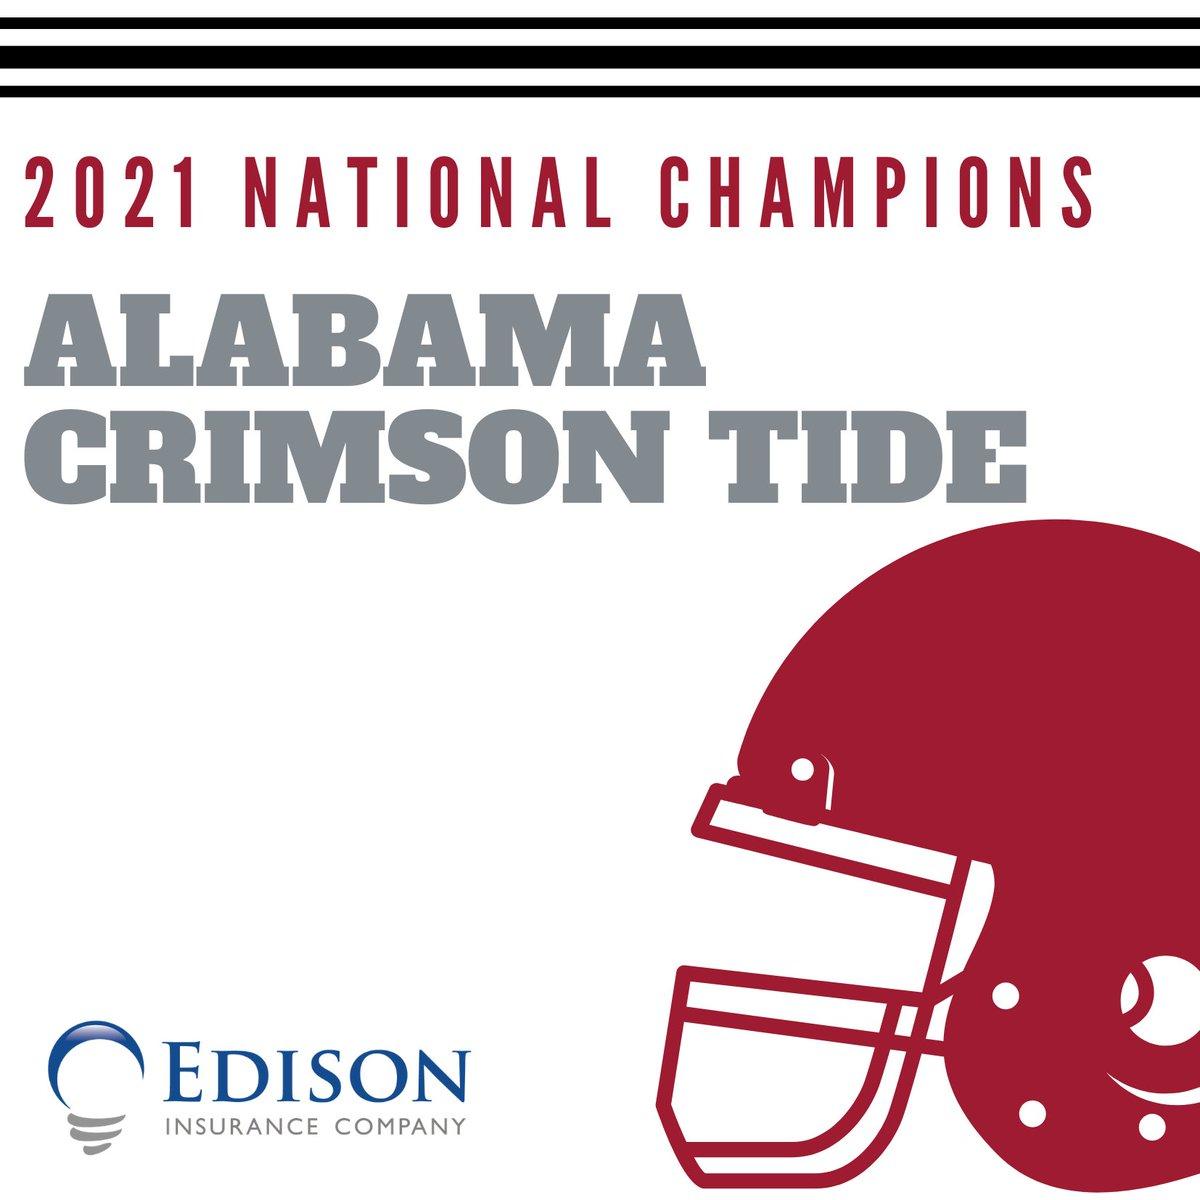 Congratulations to the Alabama Crimson Tide. #NationalChampionship